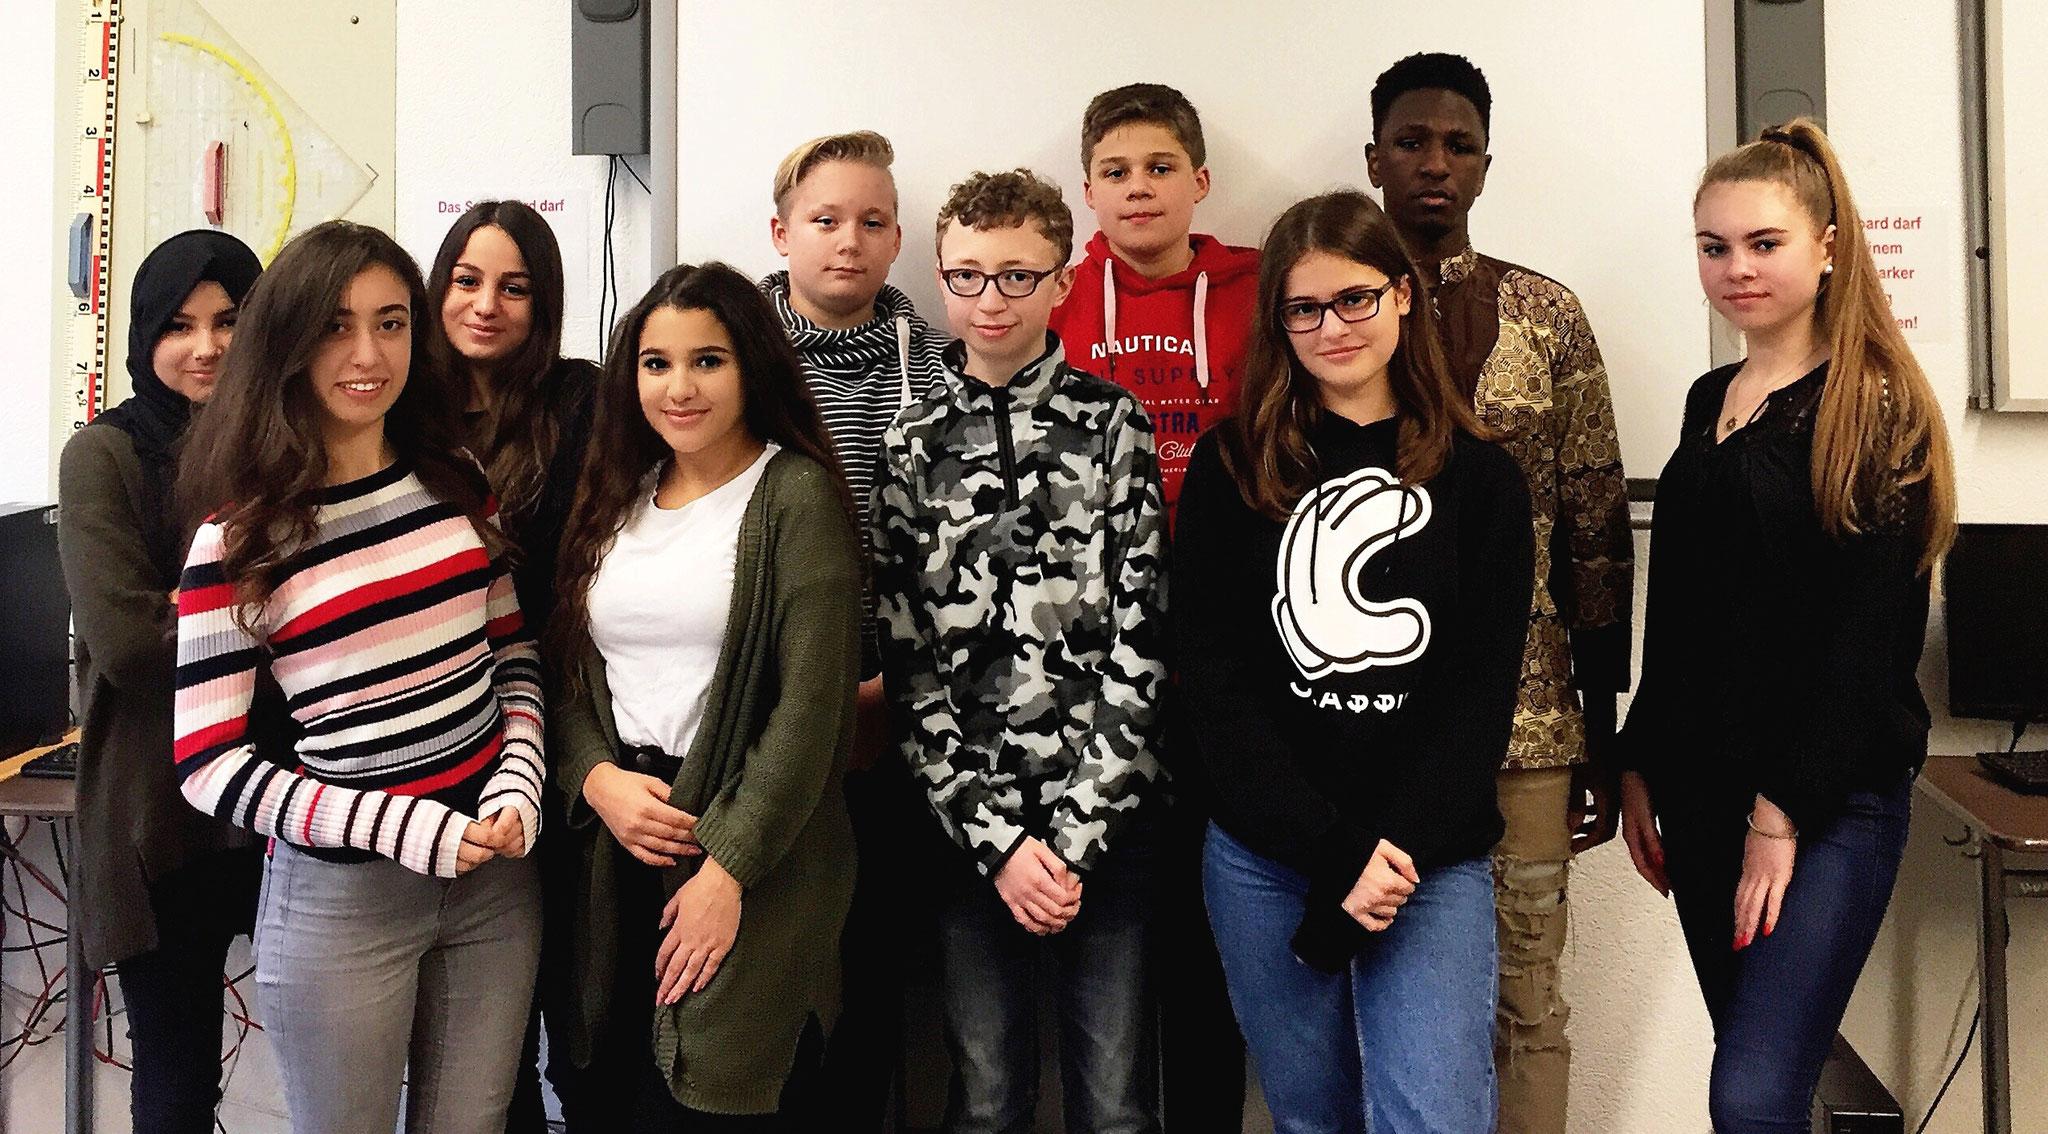 Jugendreporter der Realschule Heiligenhaus